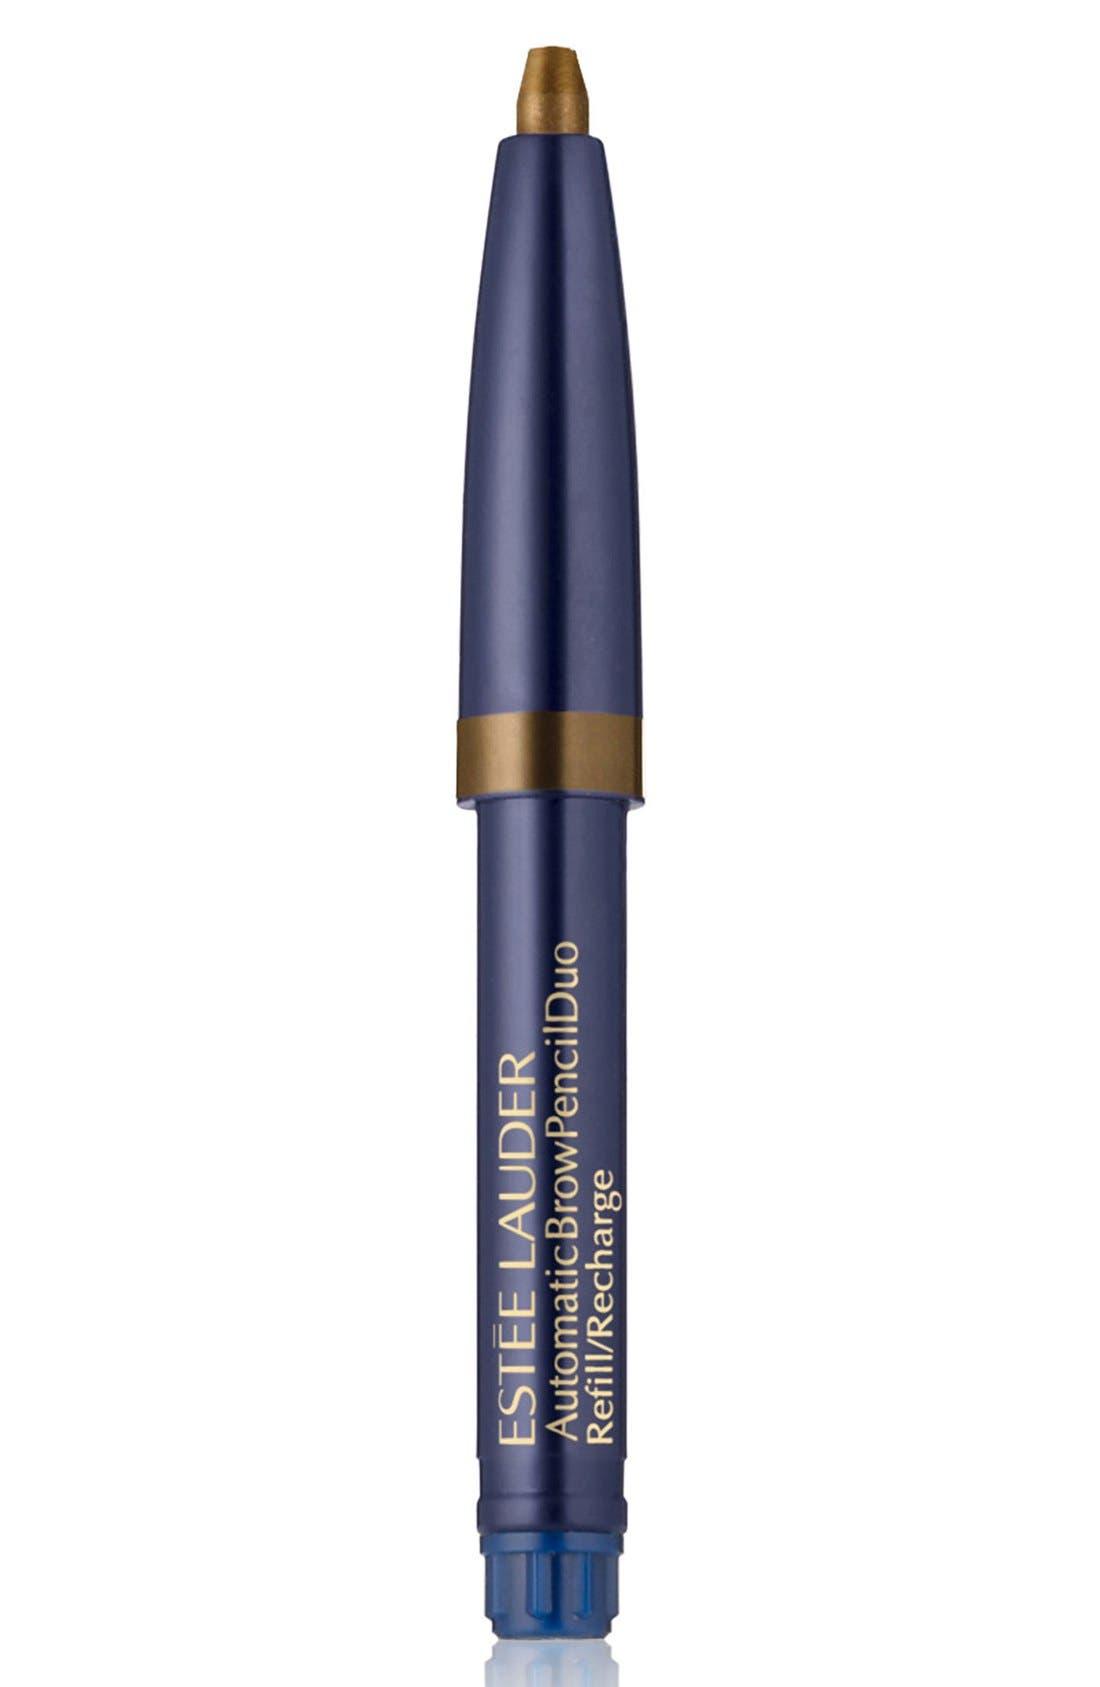 Estée Lauder Automatic Brow Pencil Duo Refill